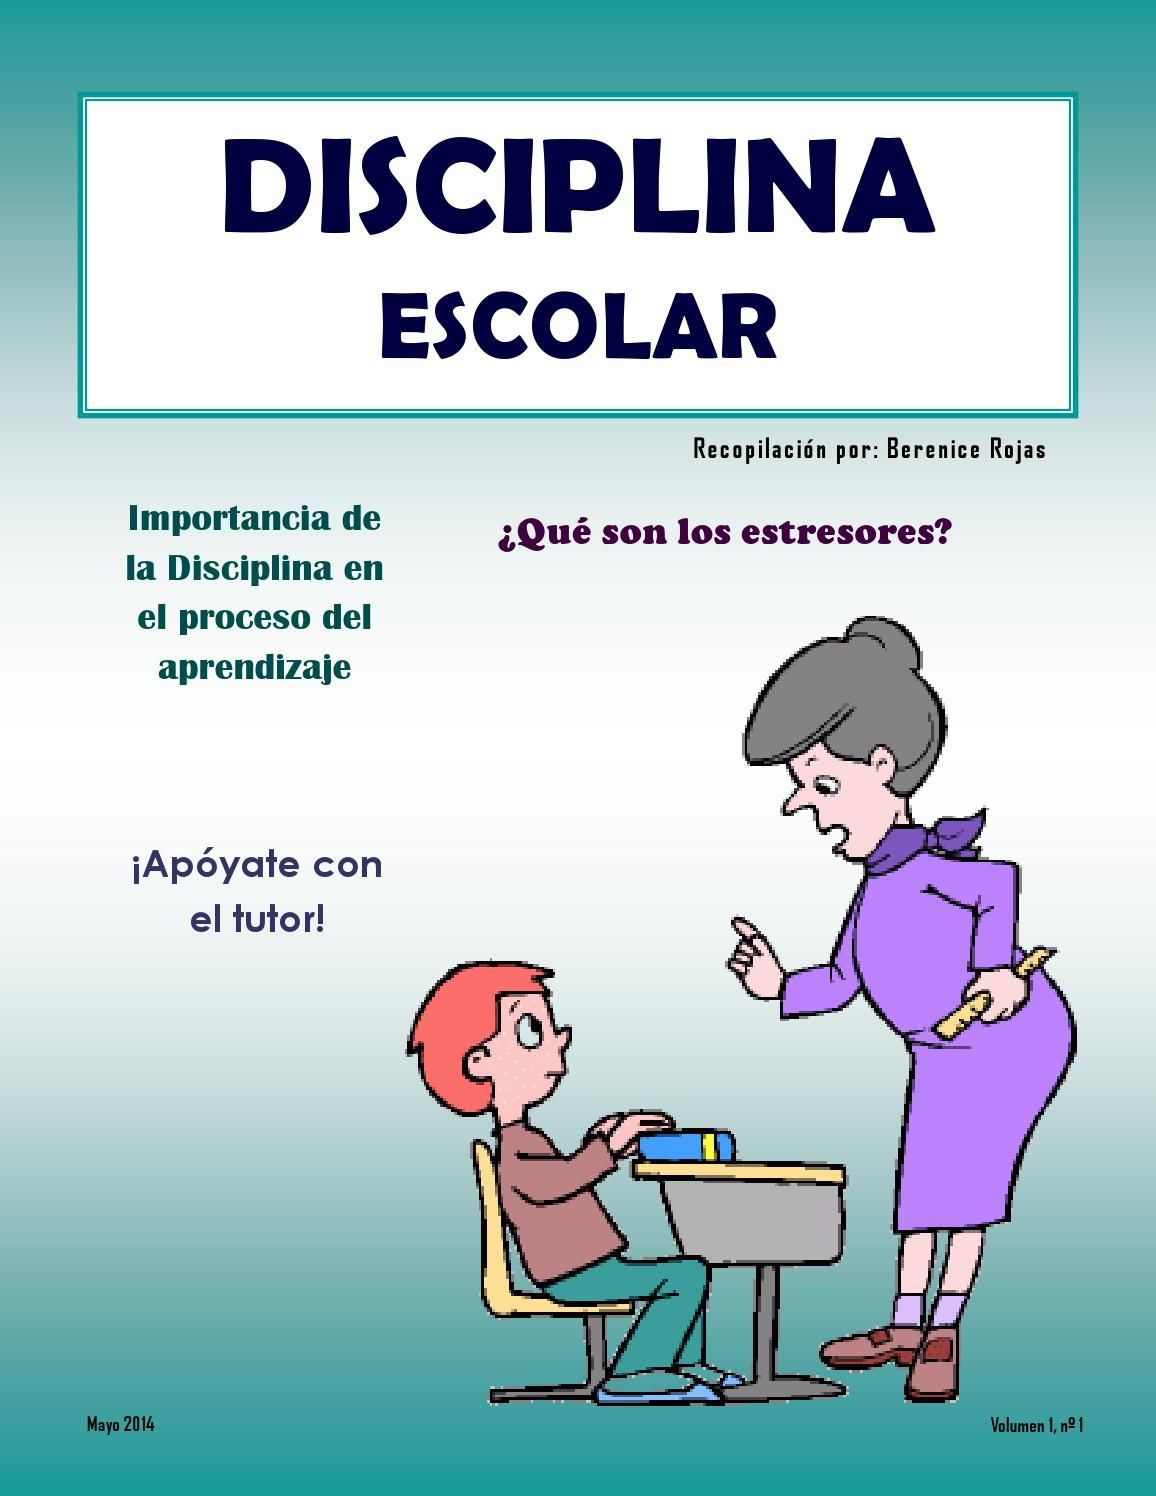 Disciplina Escolar Educativo Pinterest Berenice